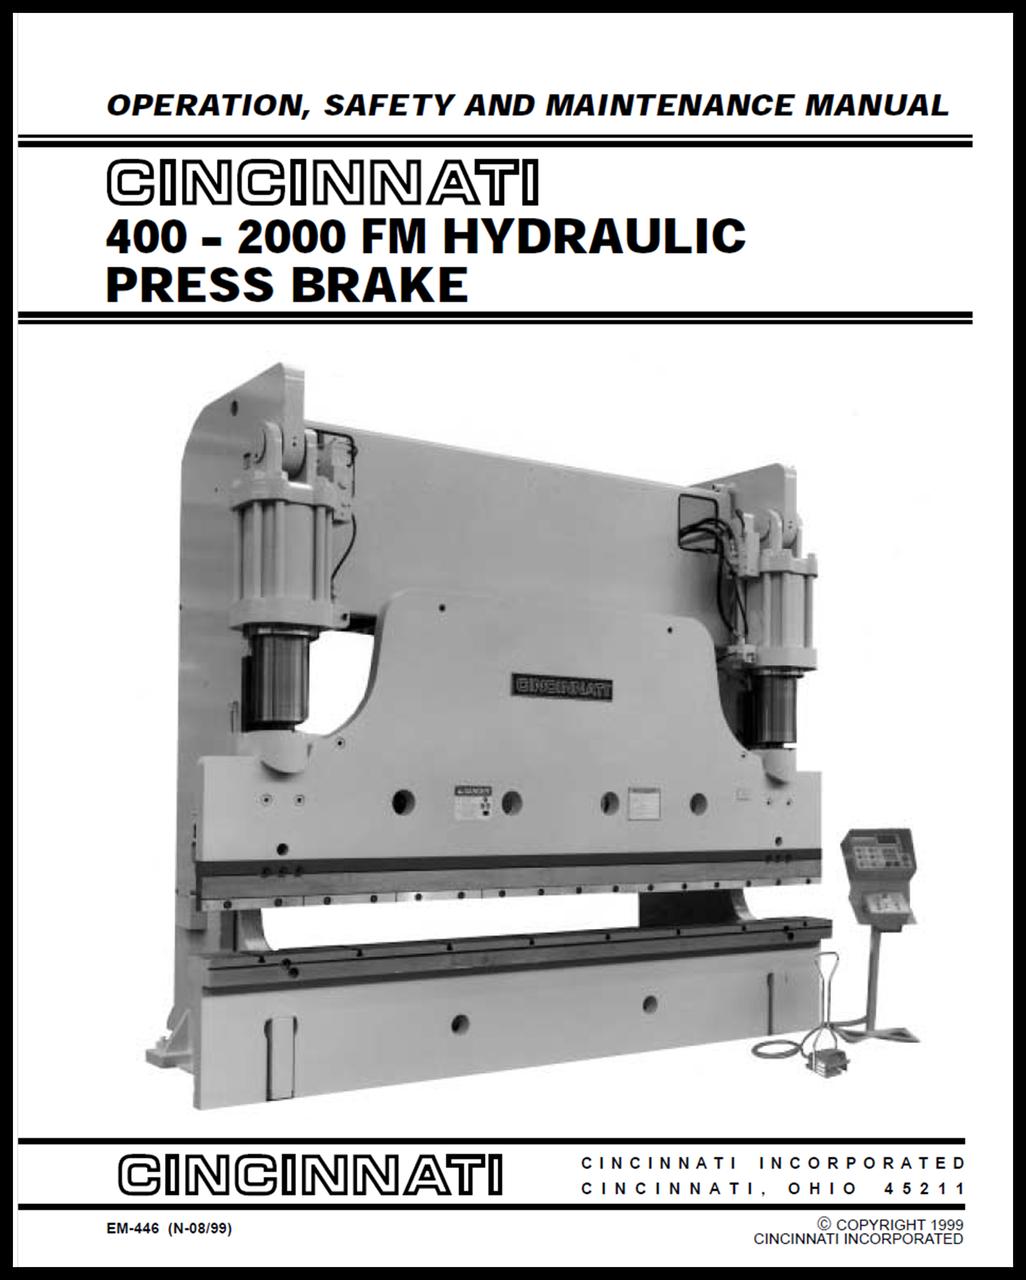 EM-446 (N-08-99) 400-2000 FM Hydraulic Press Brake - Operation, Safety and Maintenance Manual